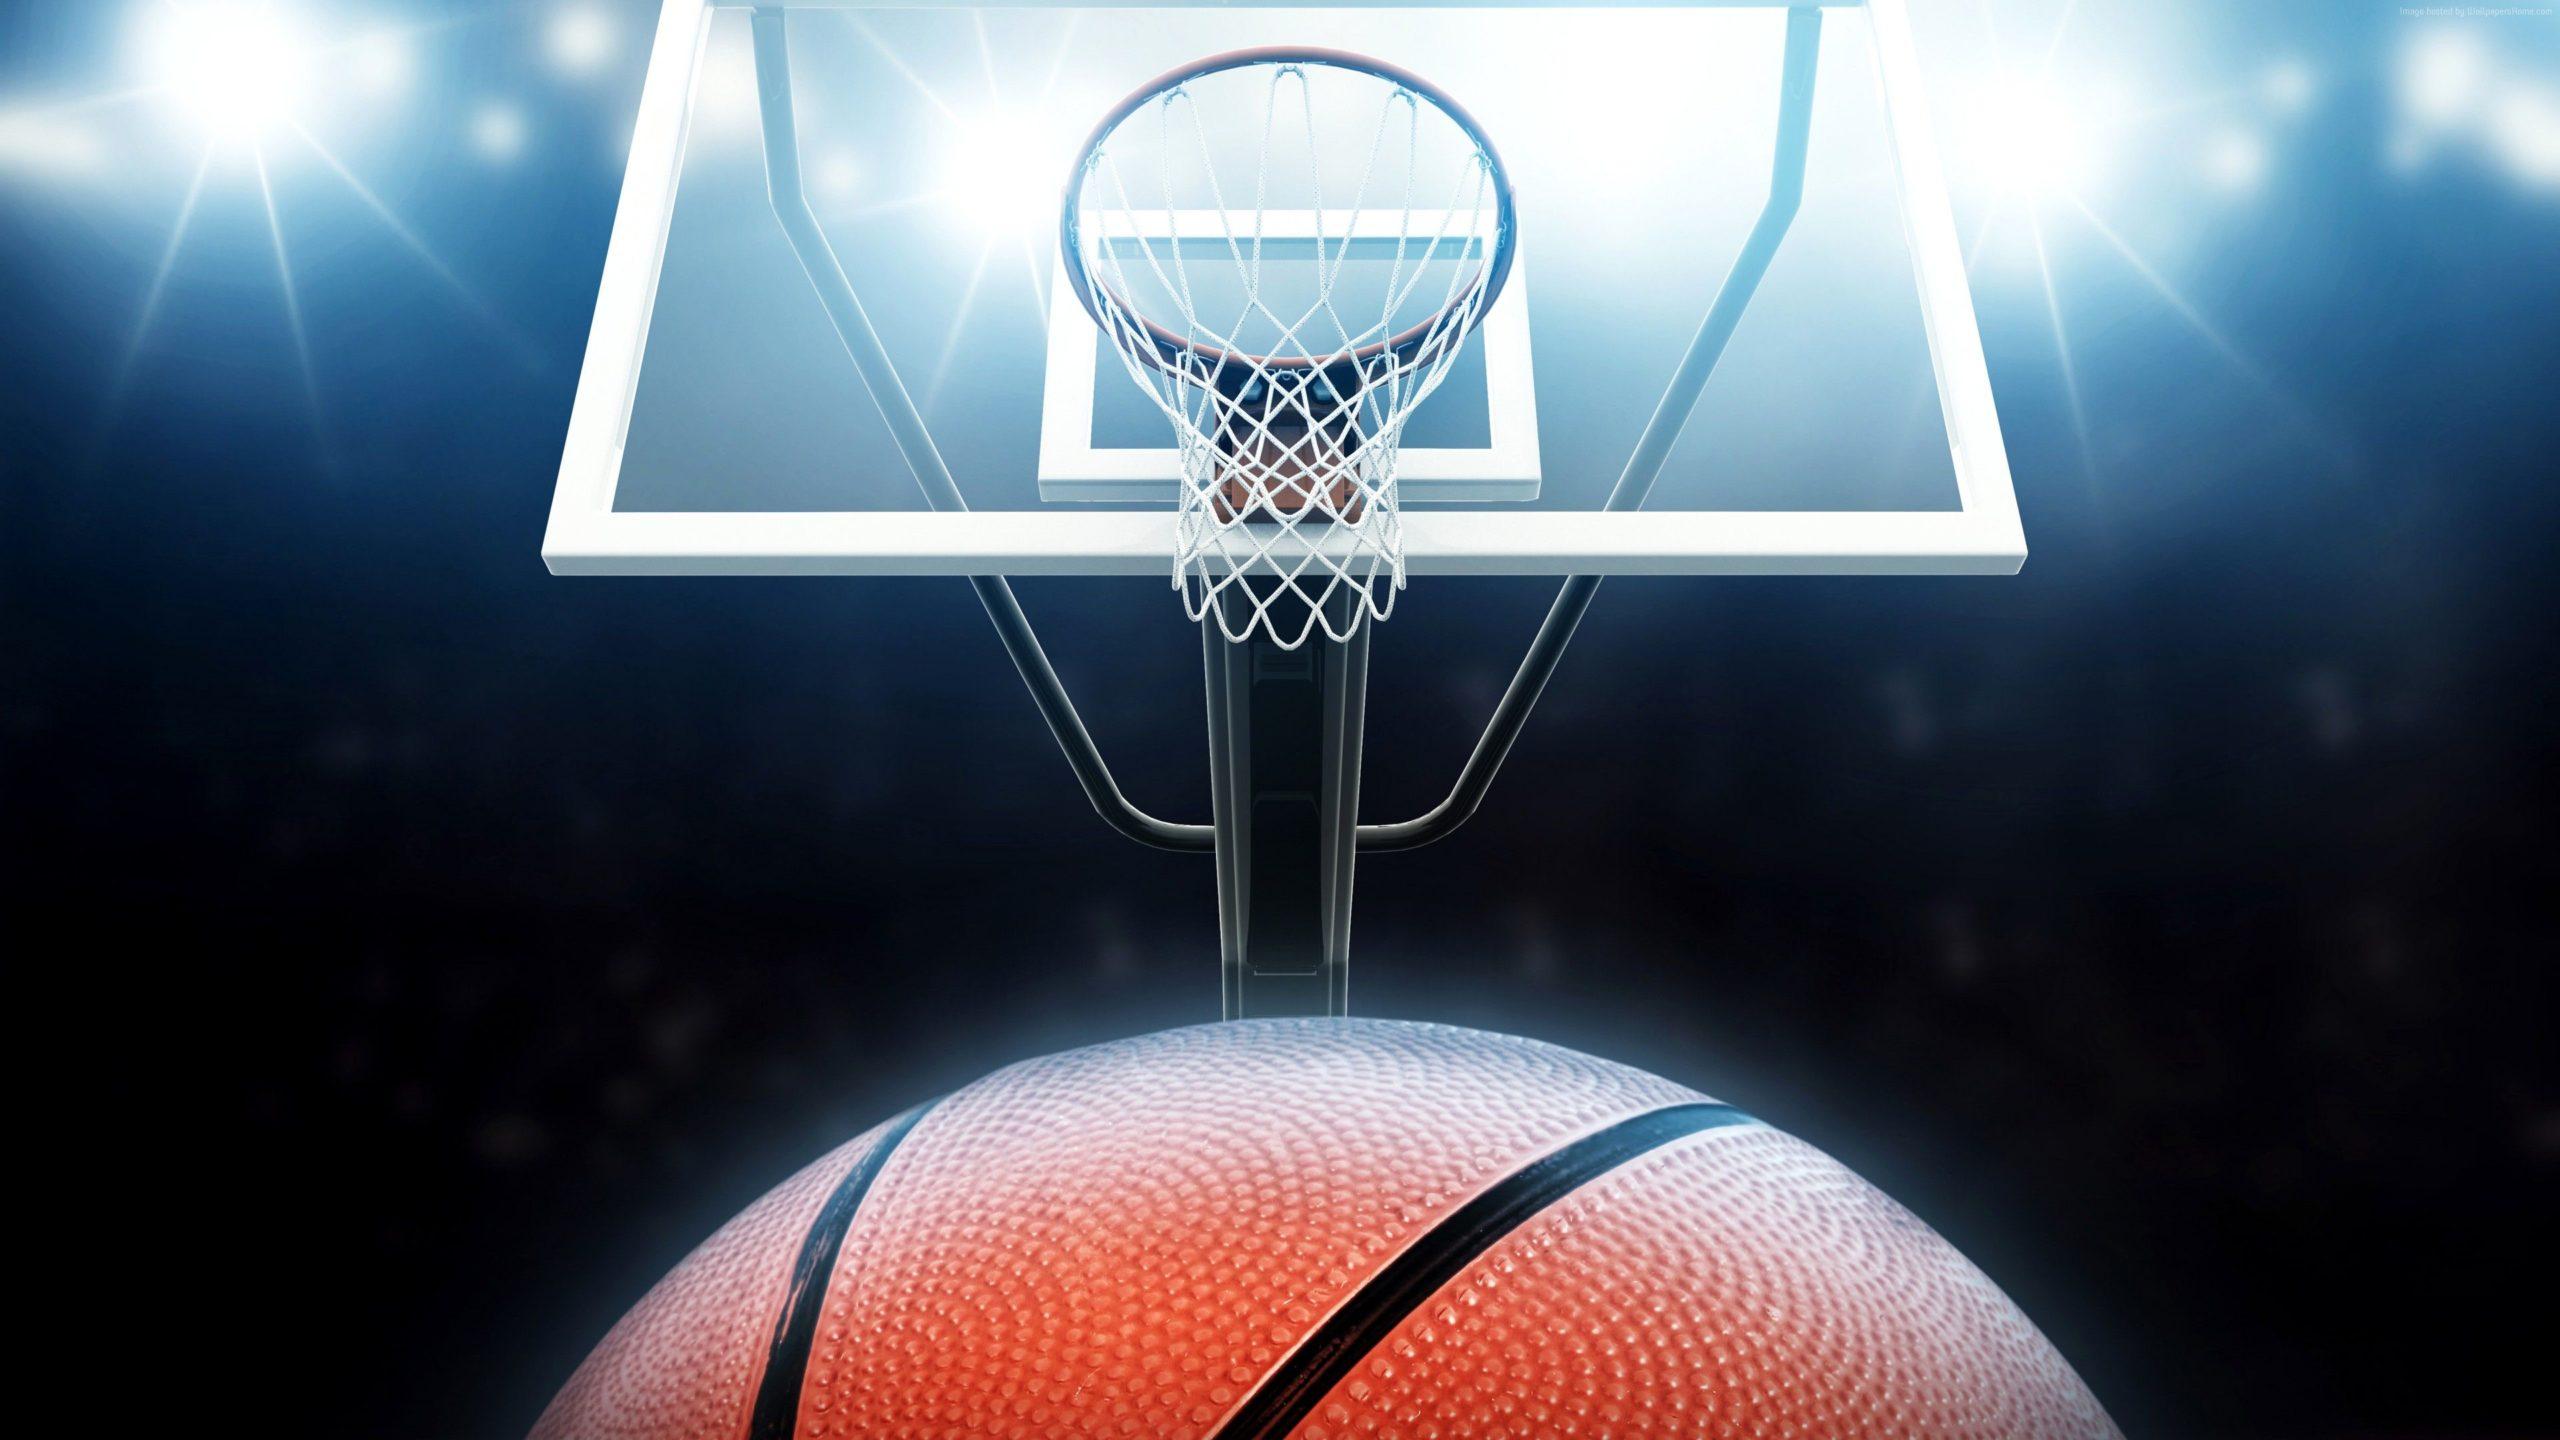 wallpaper basketbal